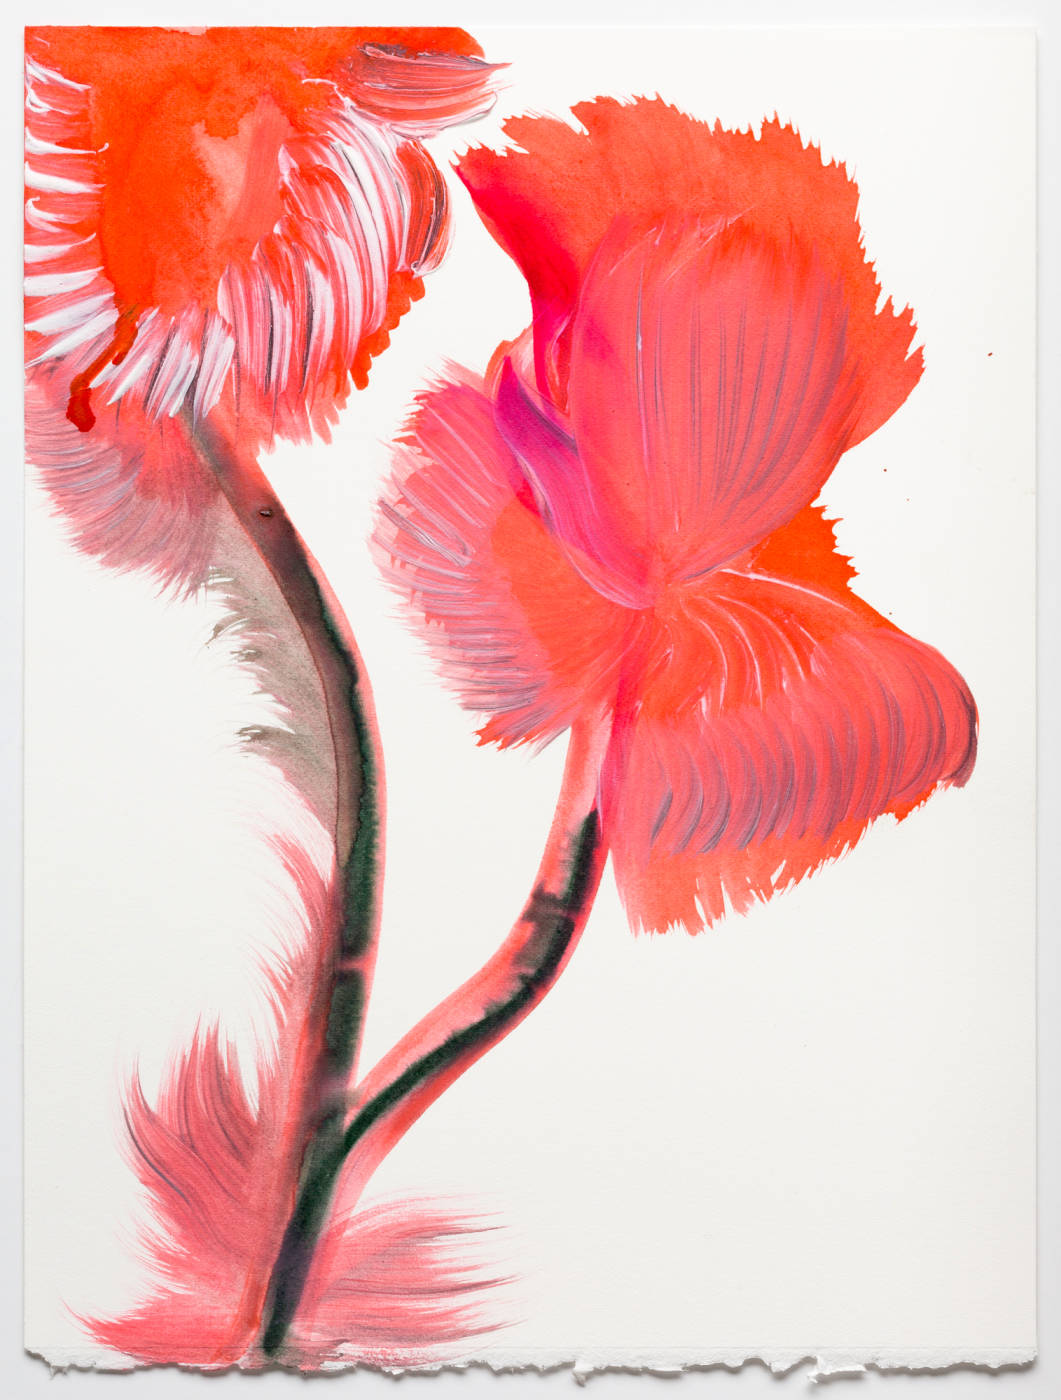 Coral Pink Flower 1